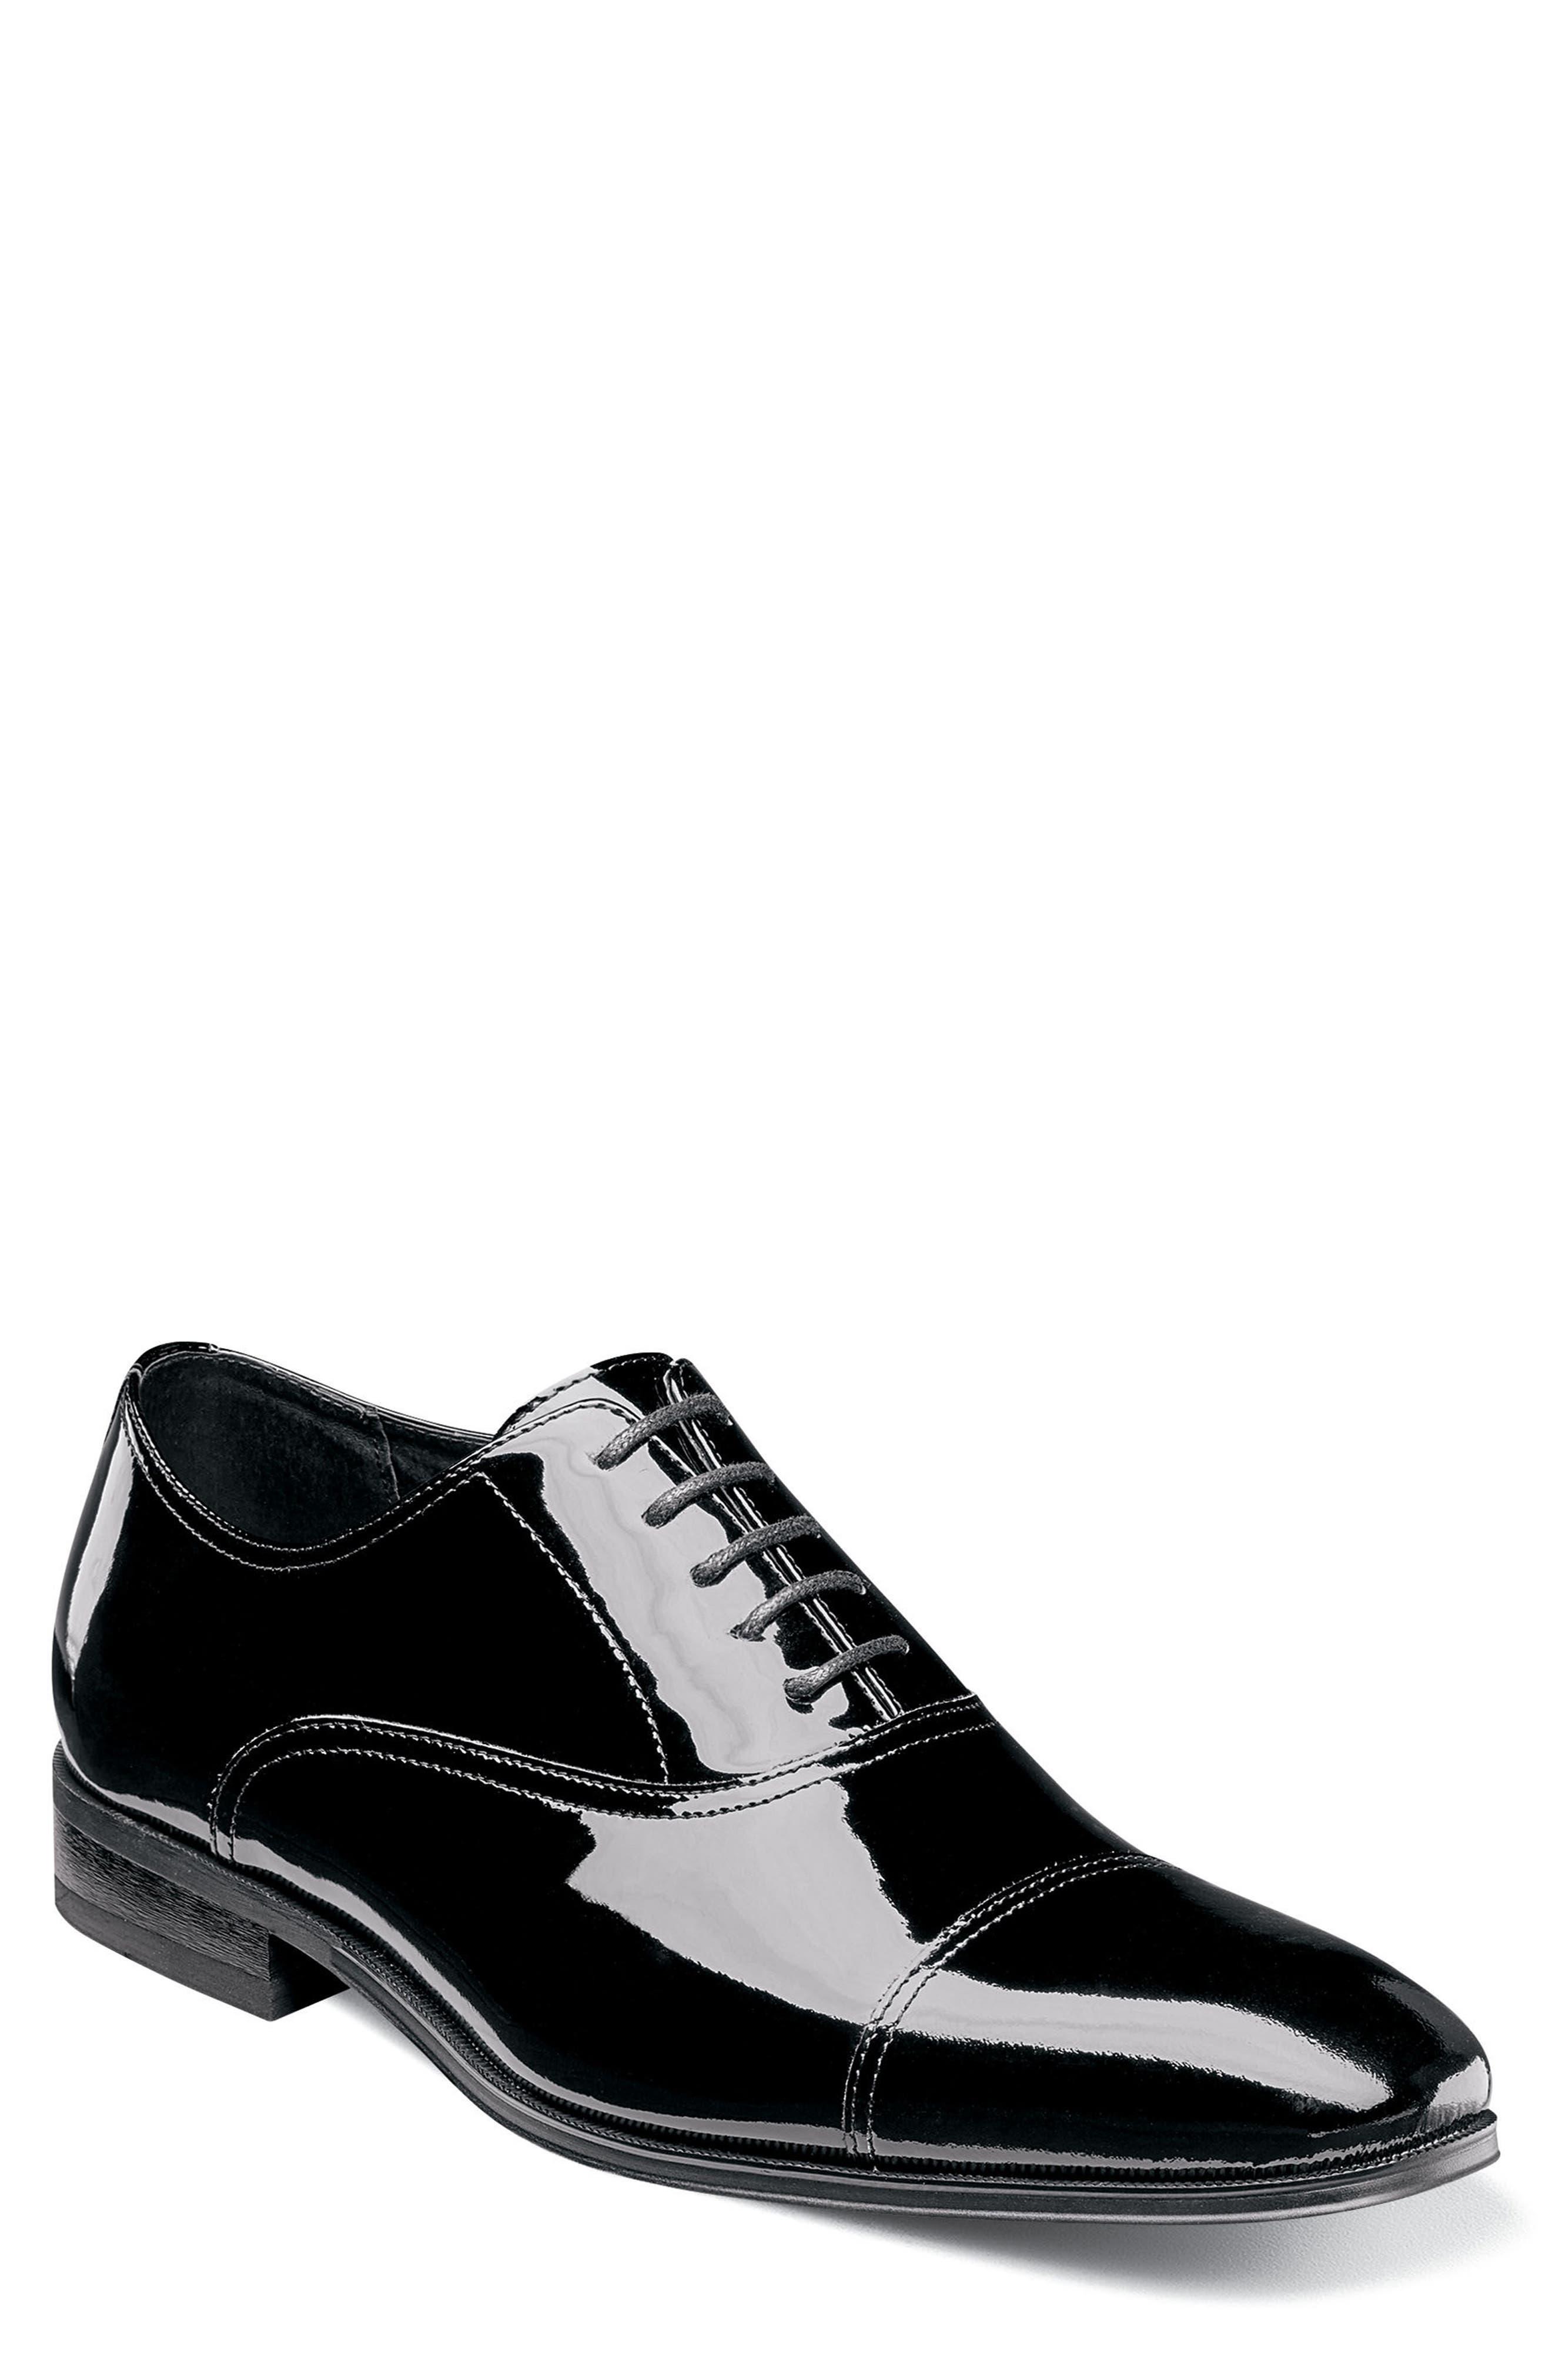 Tux Cap Toe Oxford,                             Main thumbnail 1, color,                             Black Patent Leather